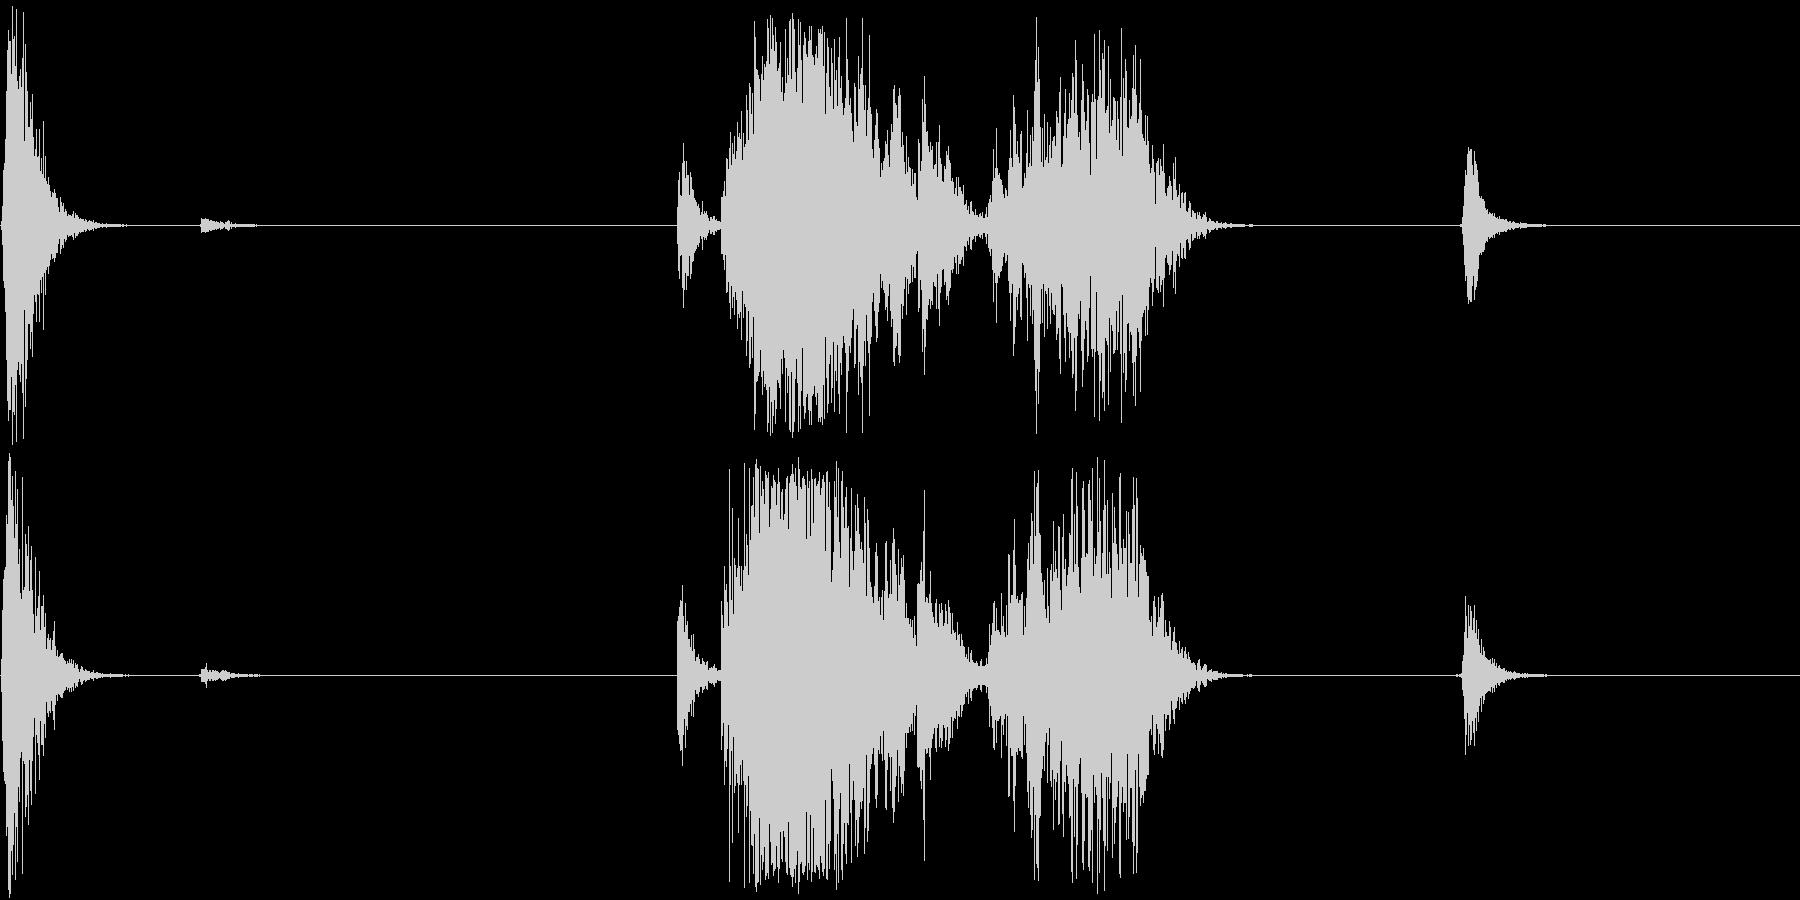 Unseal パッケージを開封する音の未再生の波形